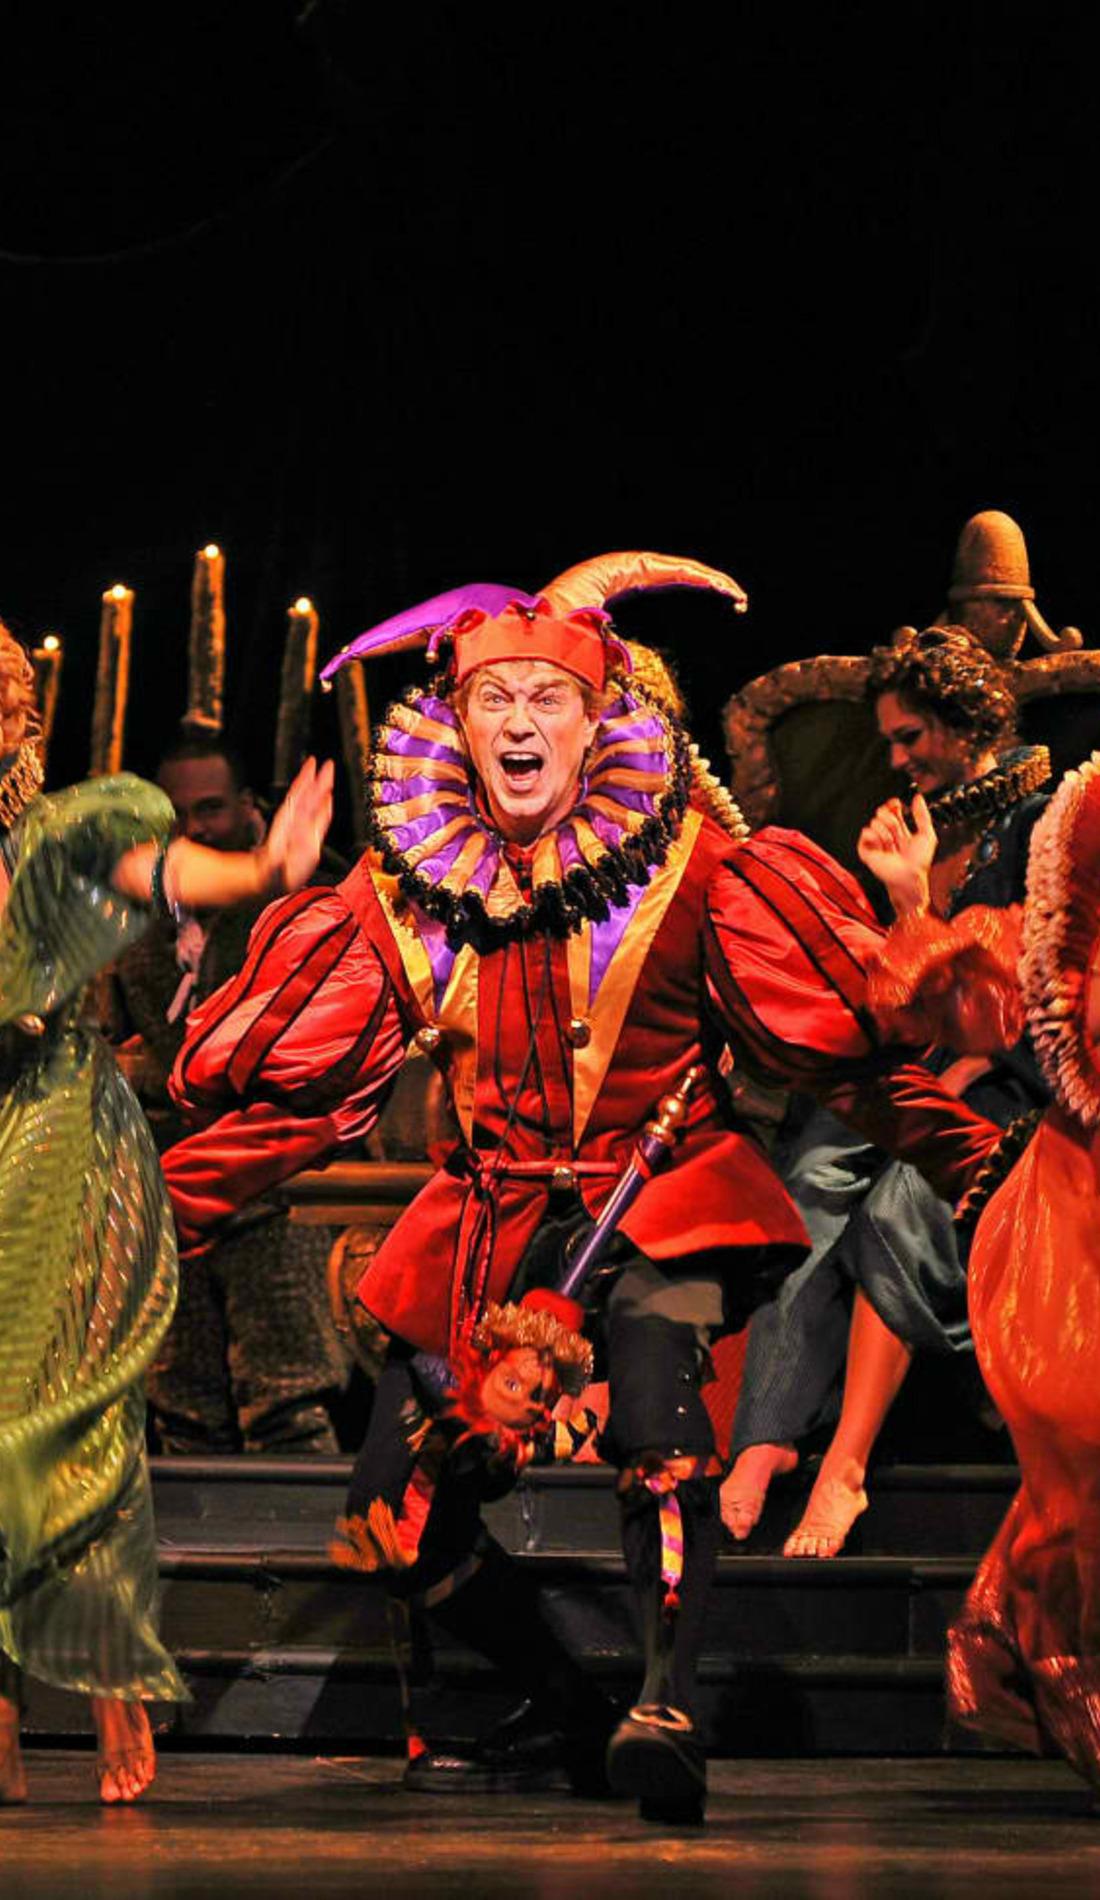 A Rigoletto live event